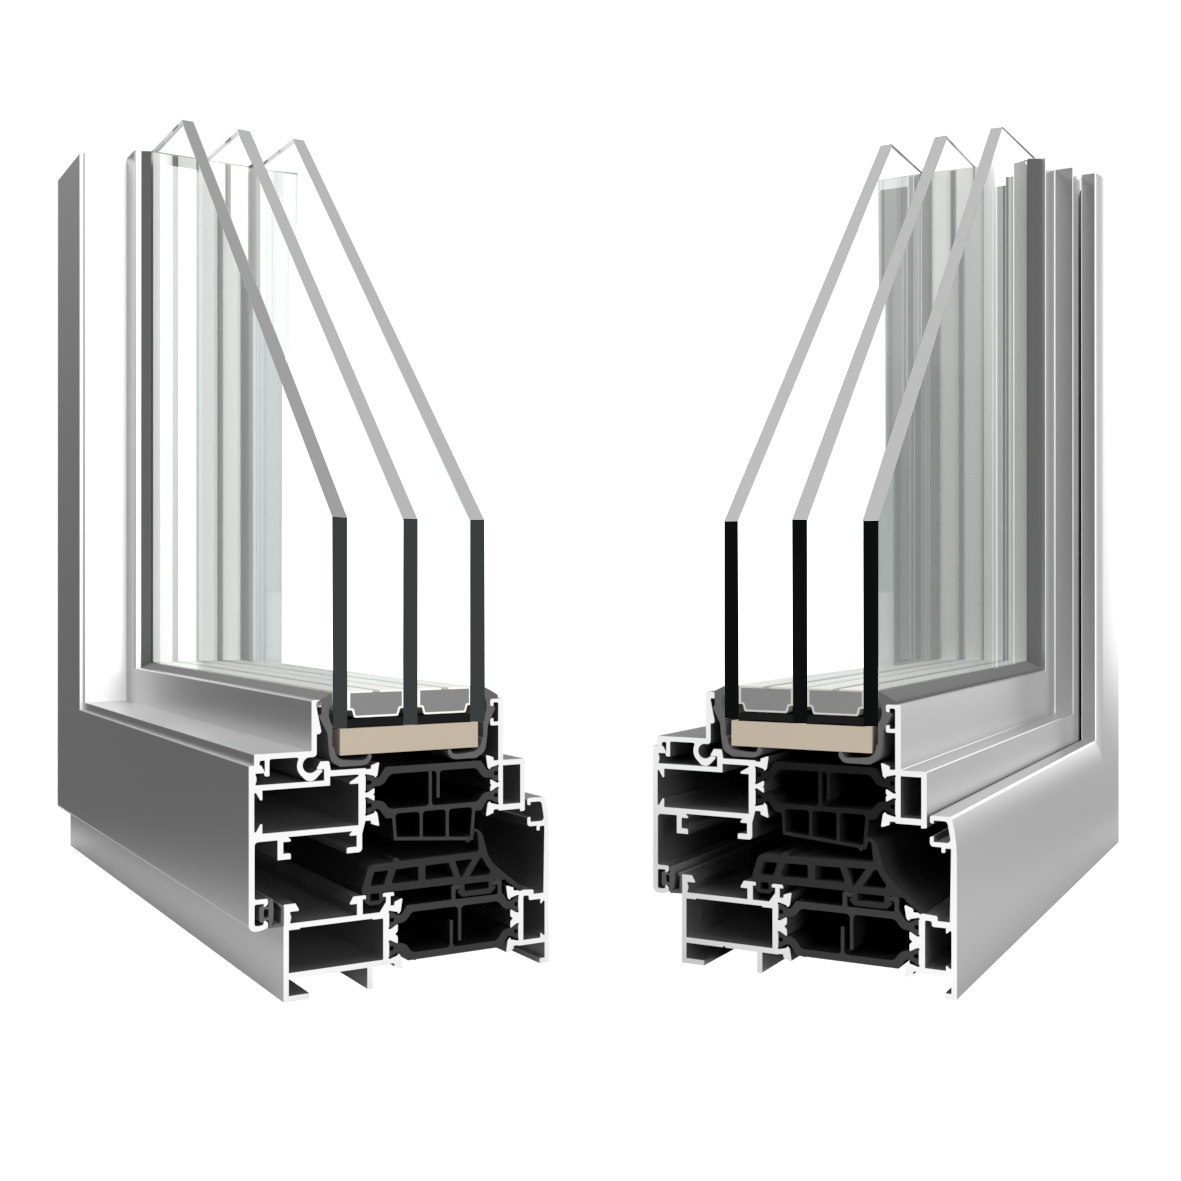 https://www.allpaint.it/wp-content/uploads/2021/07/smartline-iron-alluminio-allpaint.jpg